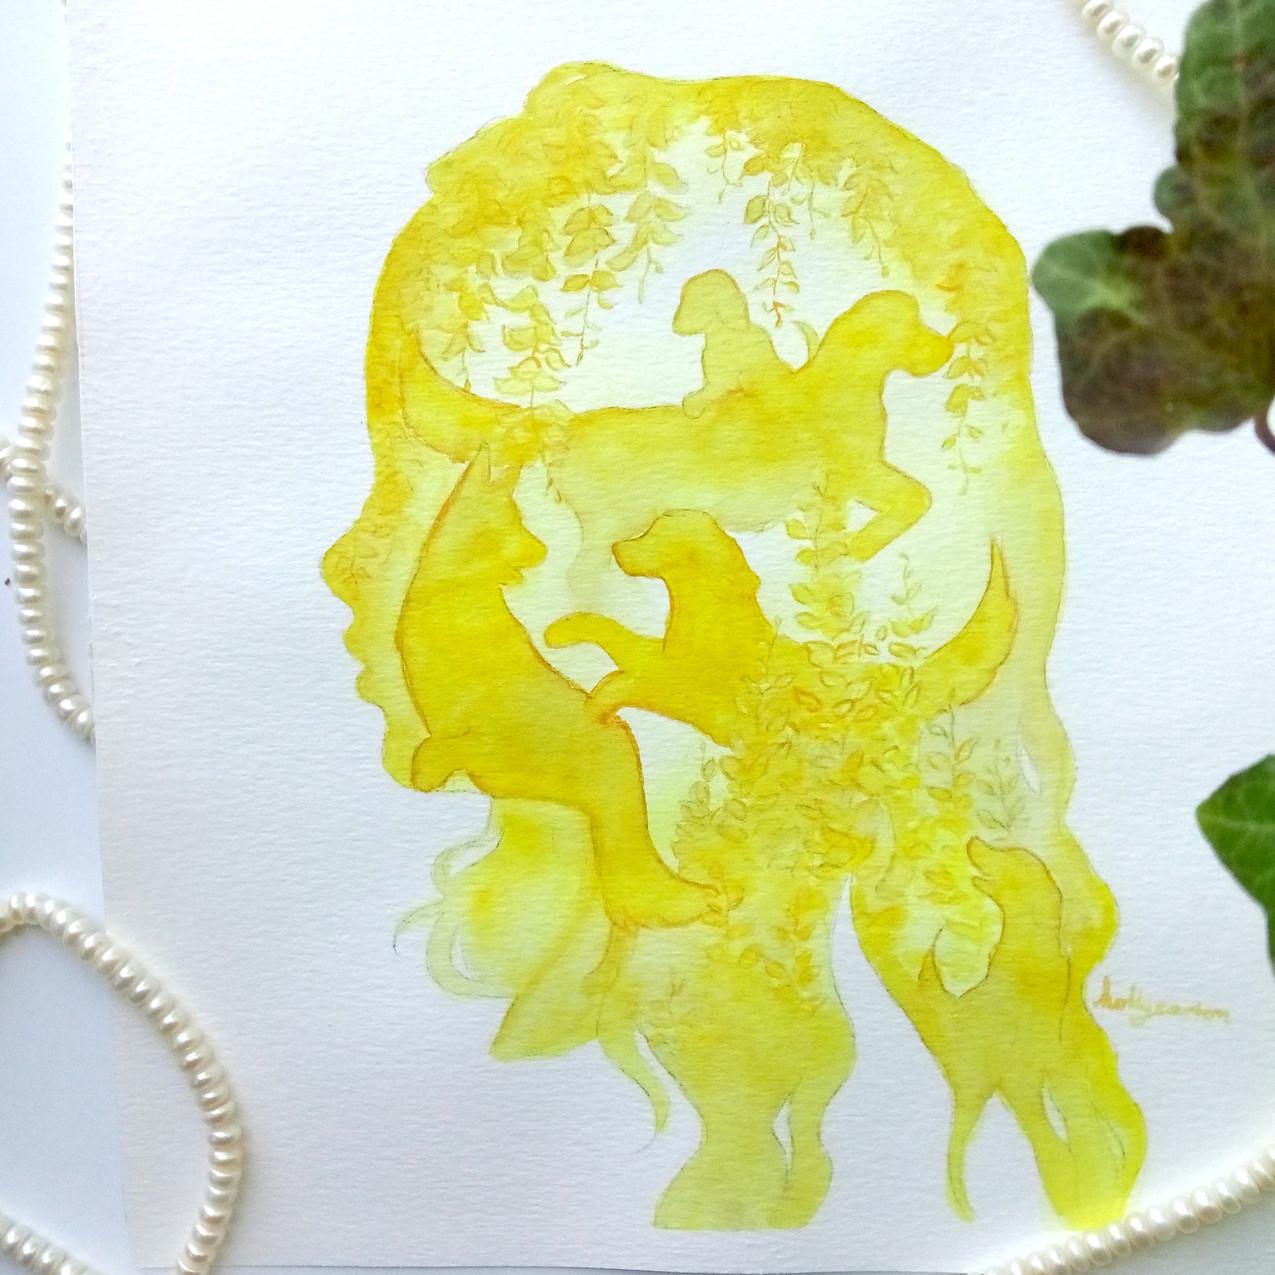 yellow silhouette